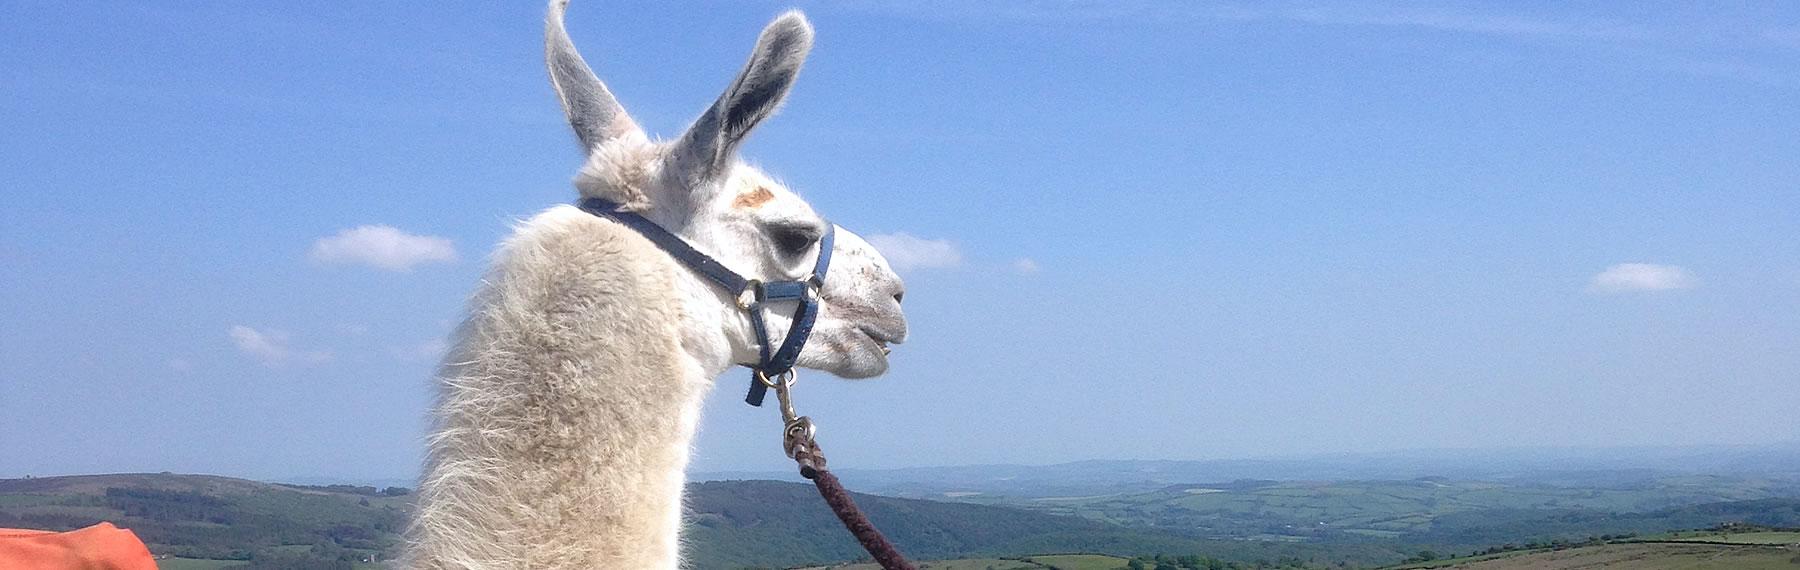 Llama Taking in Dartmoor View